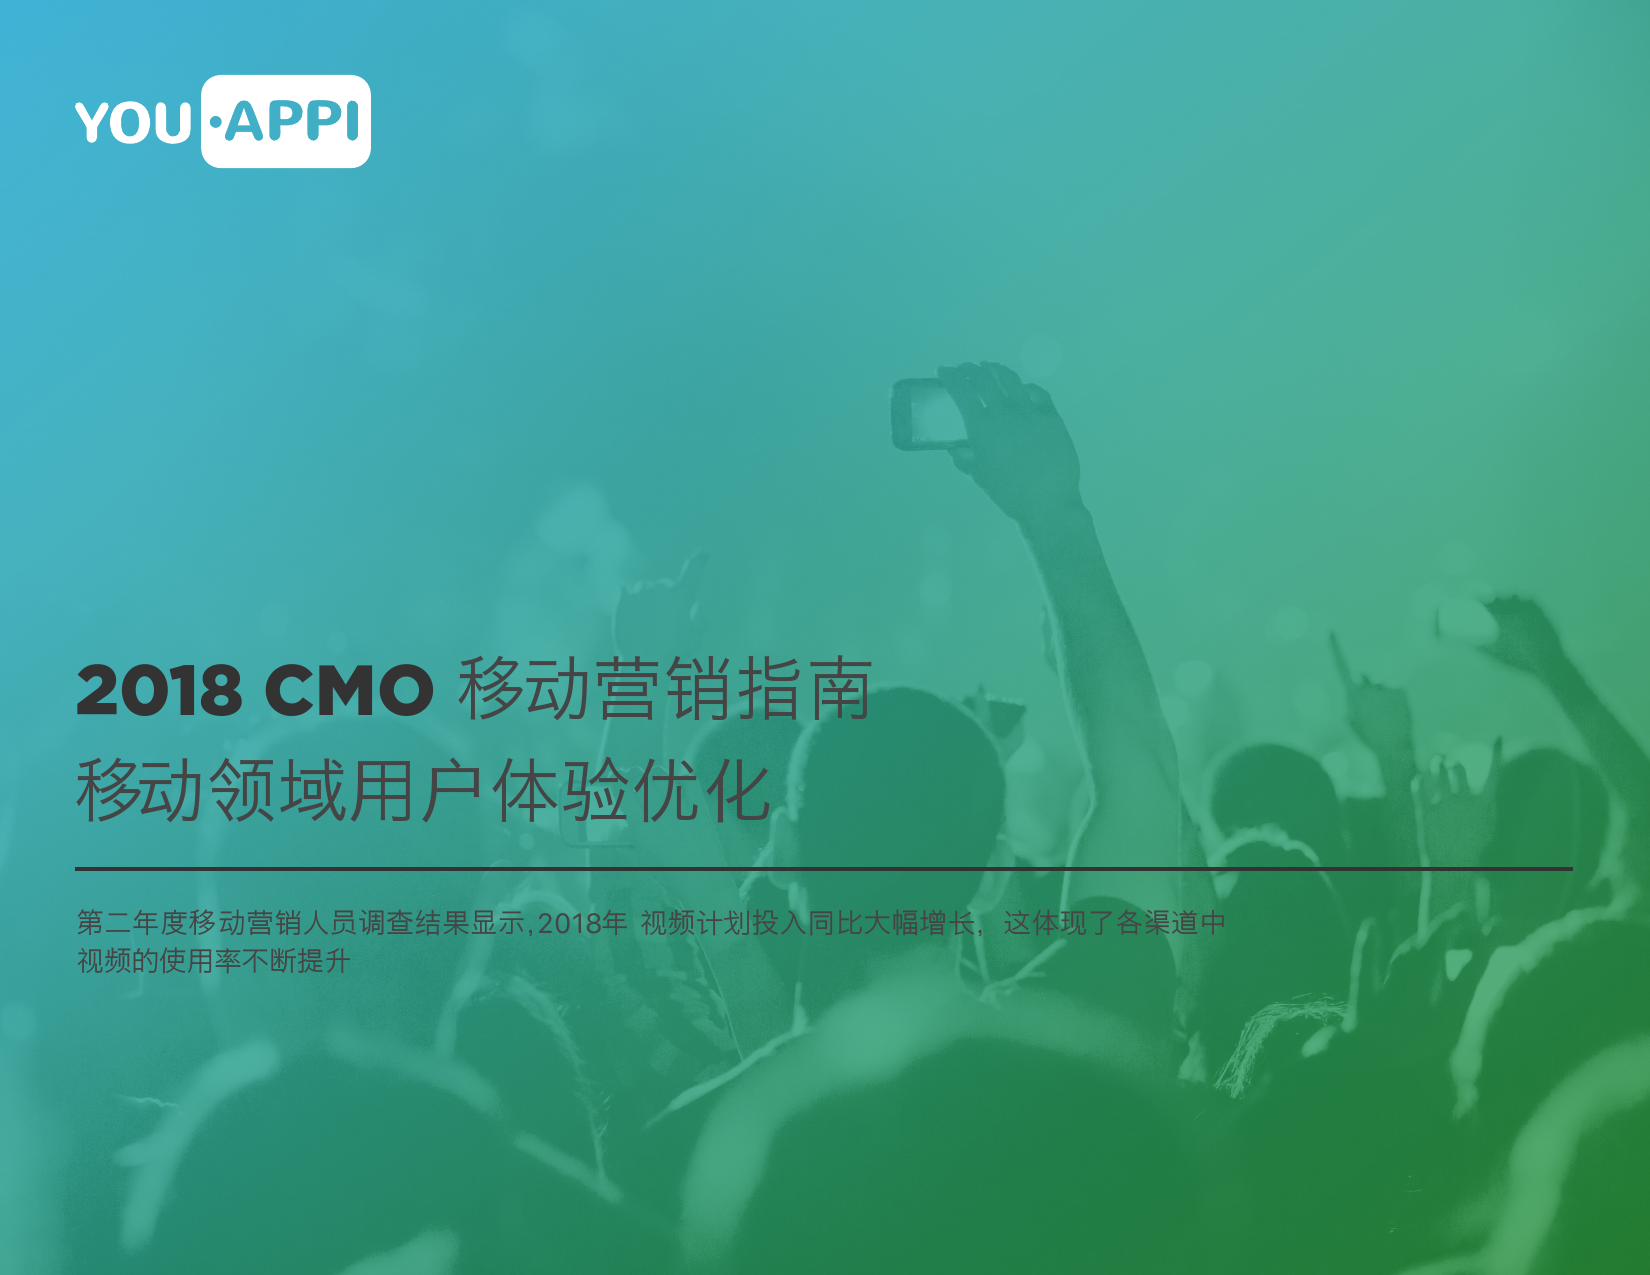 YouAppi:2018年CMO移动营销指南(附下载)